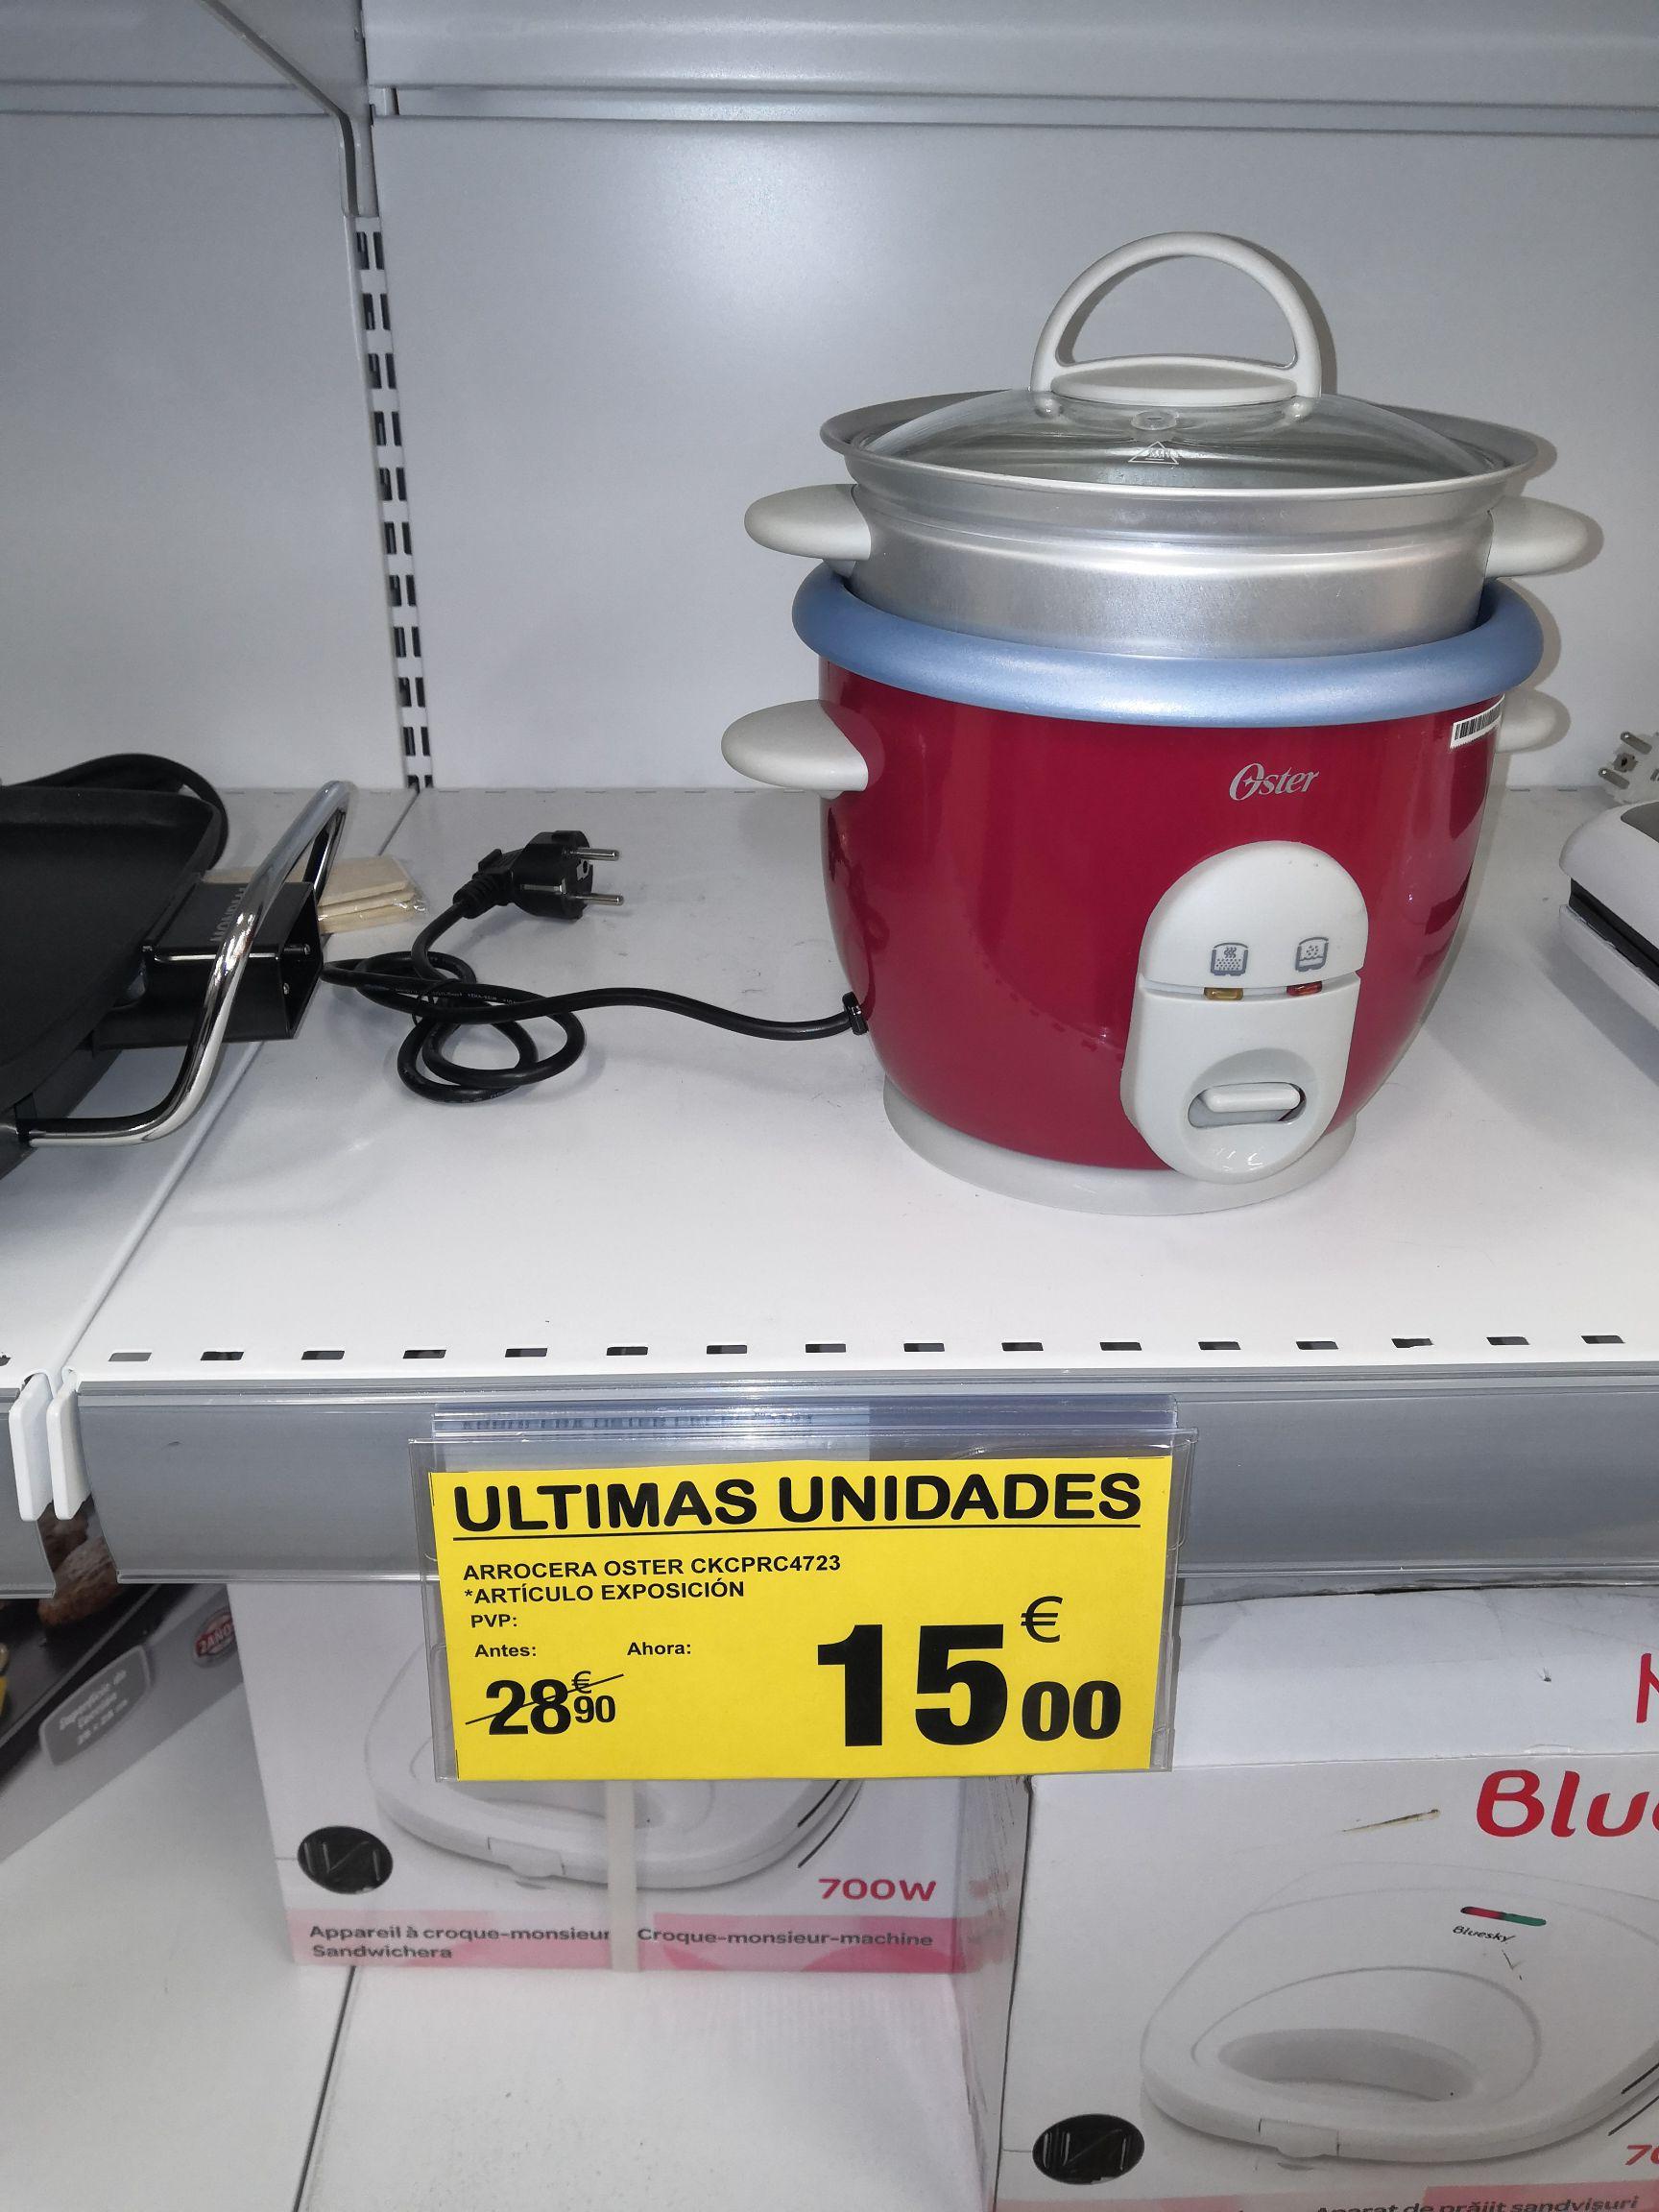 Arrocera Oster - Ultimas unidades